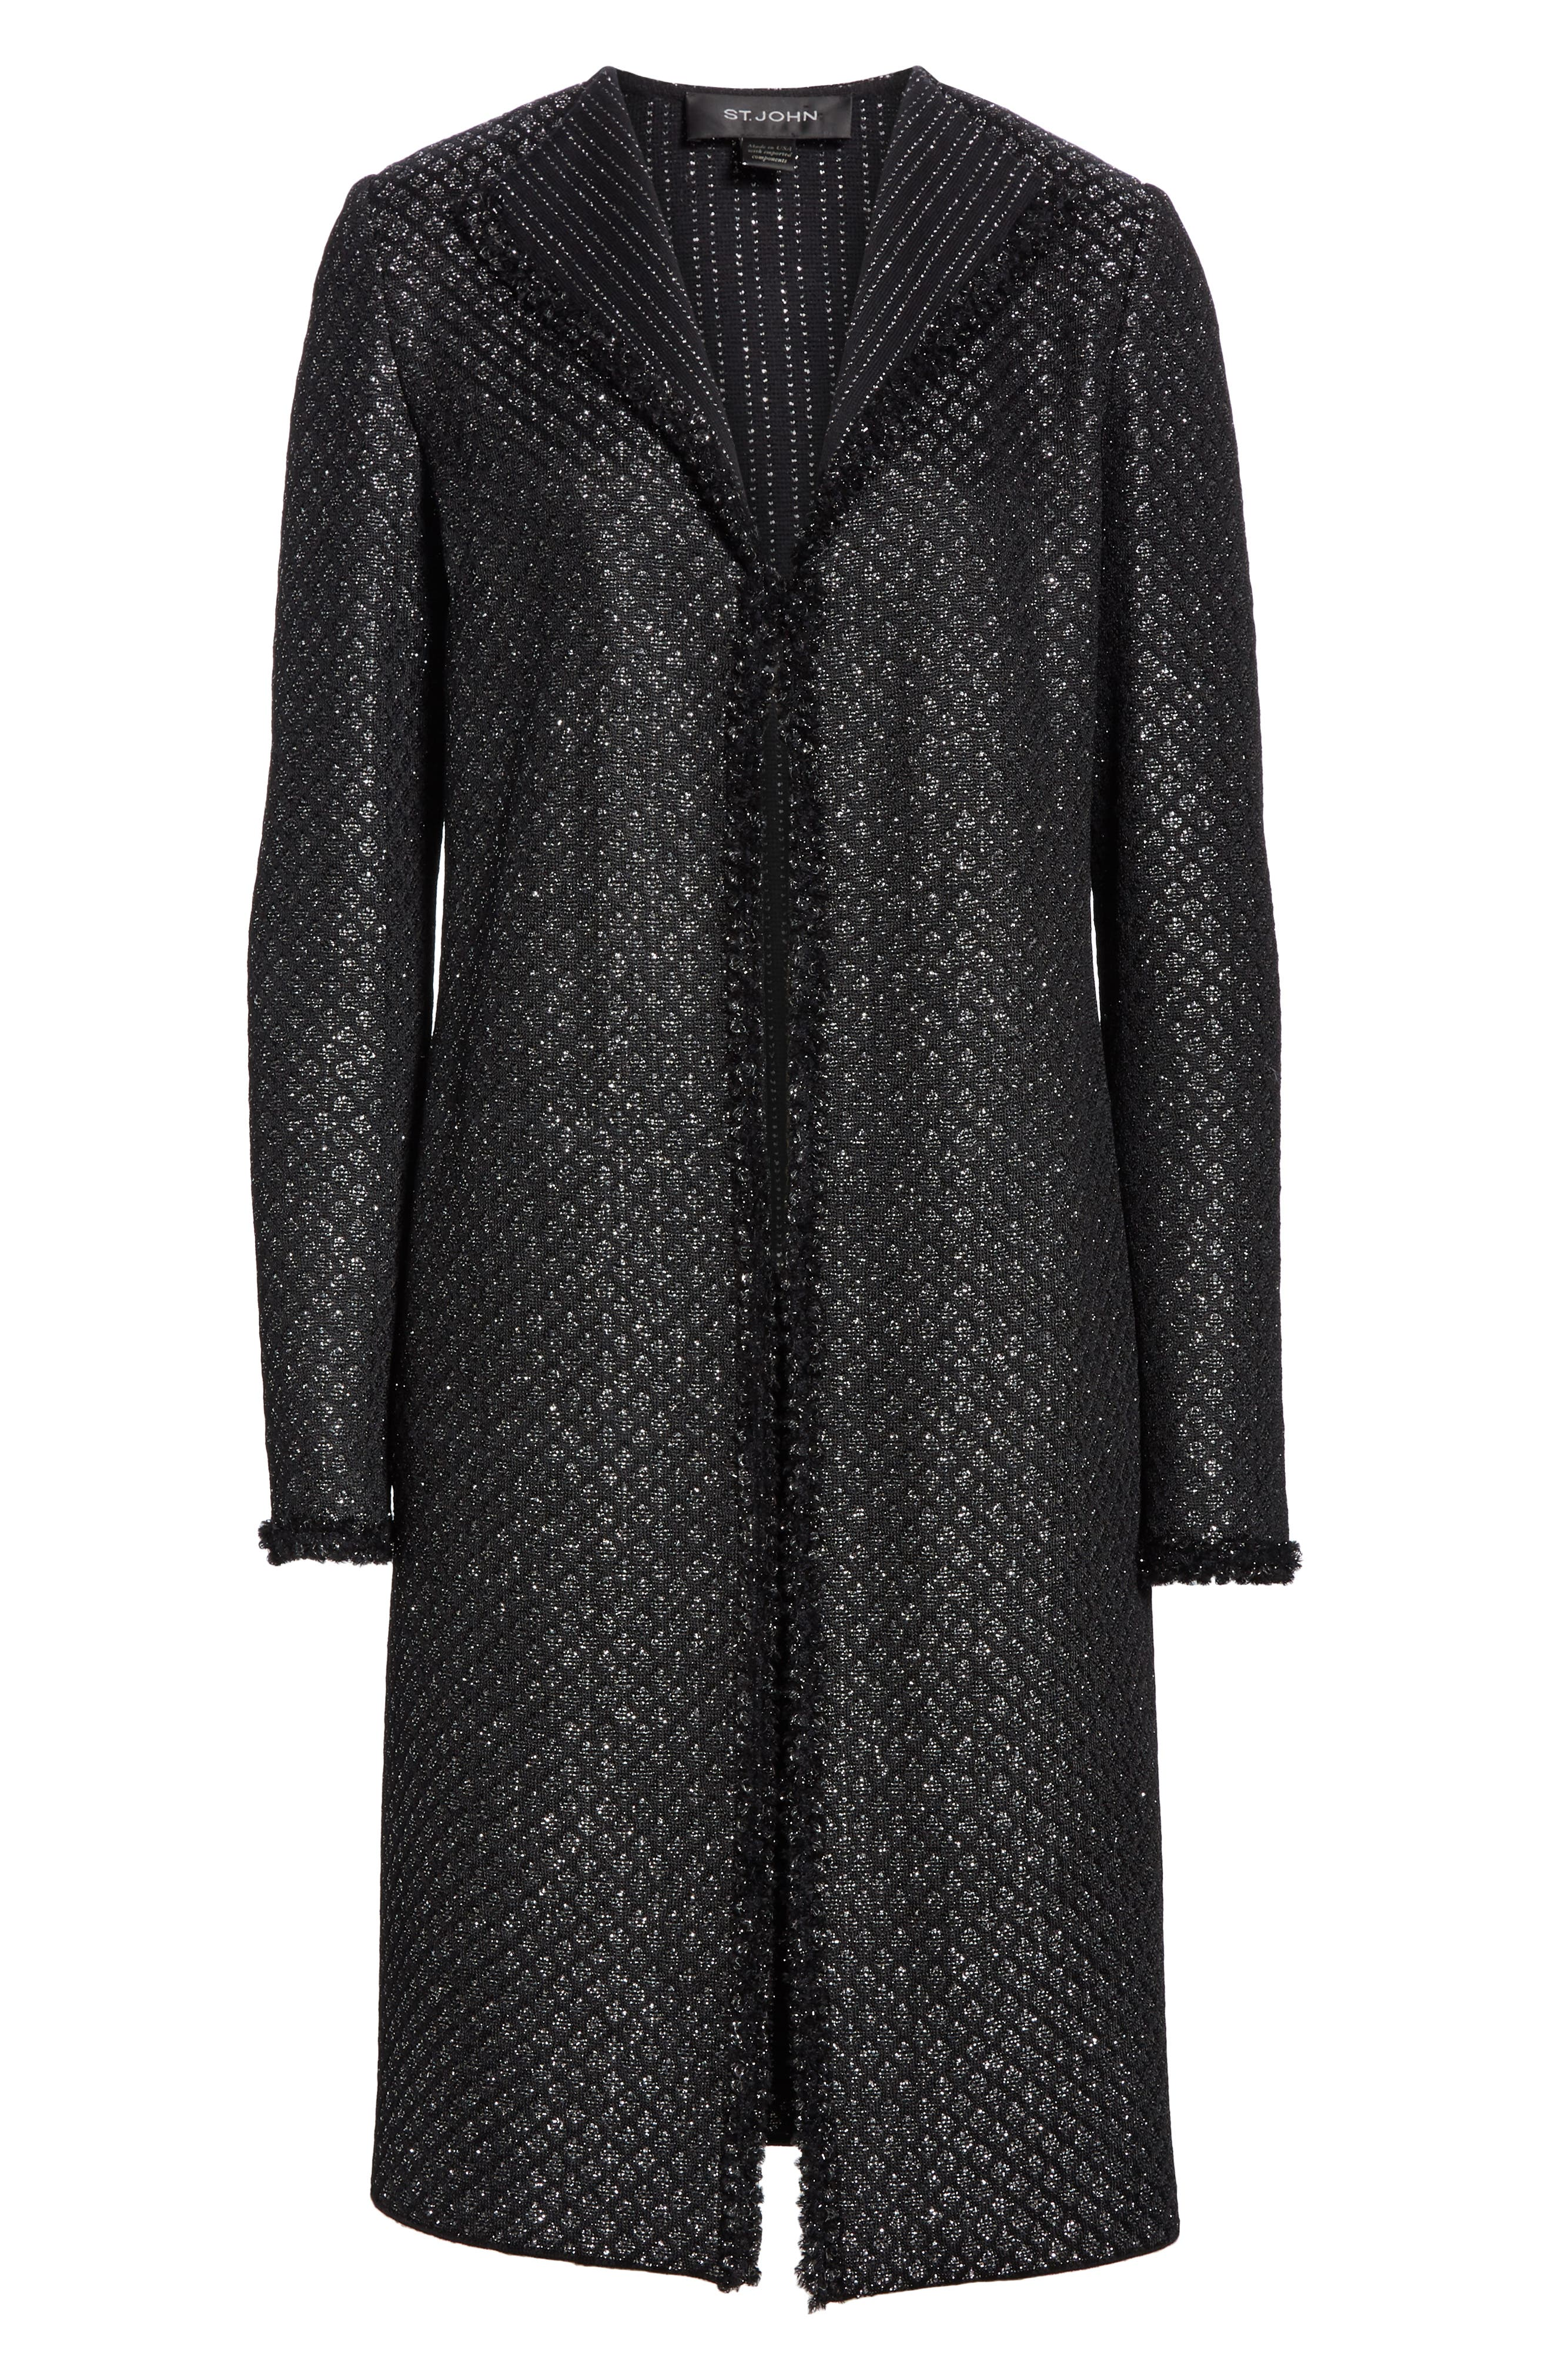 Shimmer Inlay Brocade Knit Jacket,                             Alternate thumbnail 6, color,                             CAVIAR/ SILVER